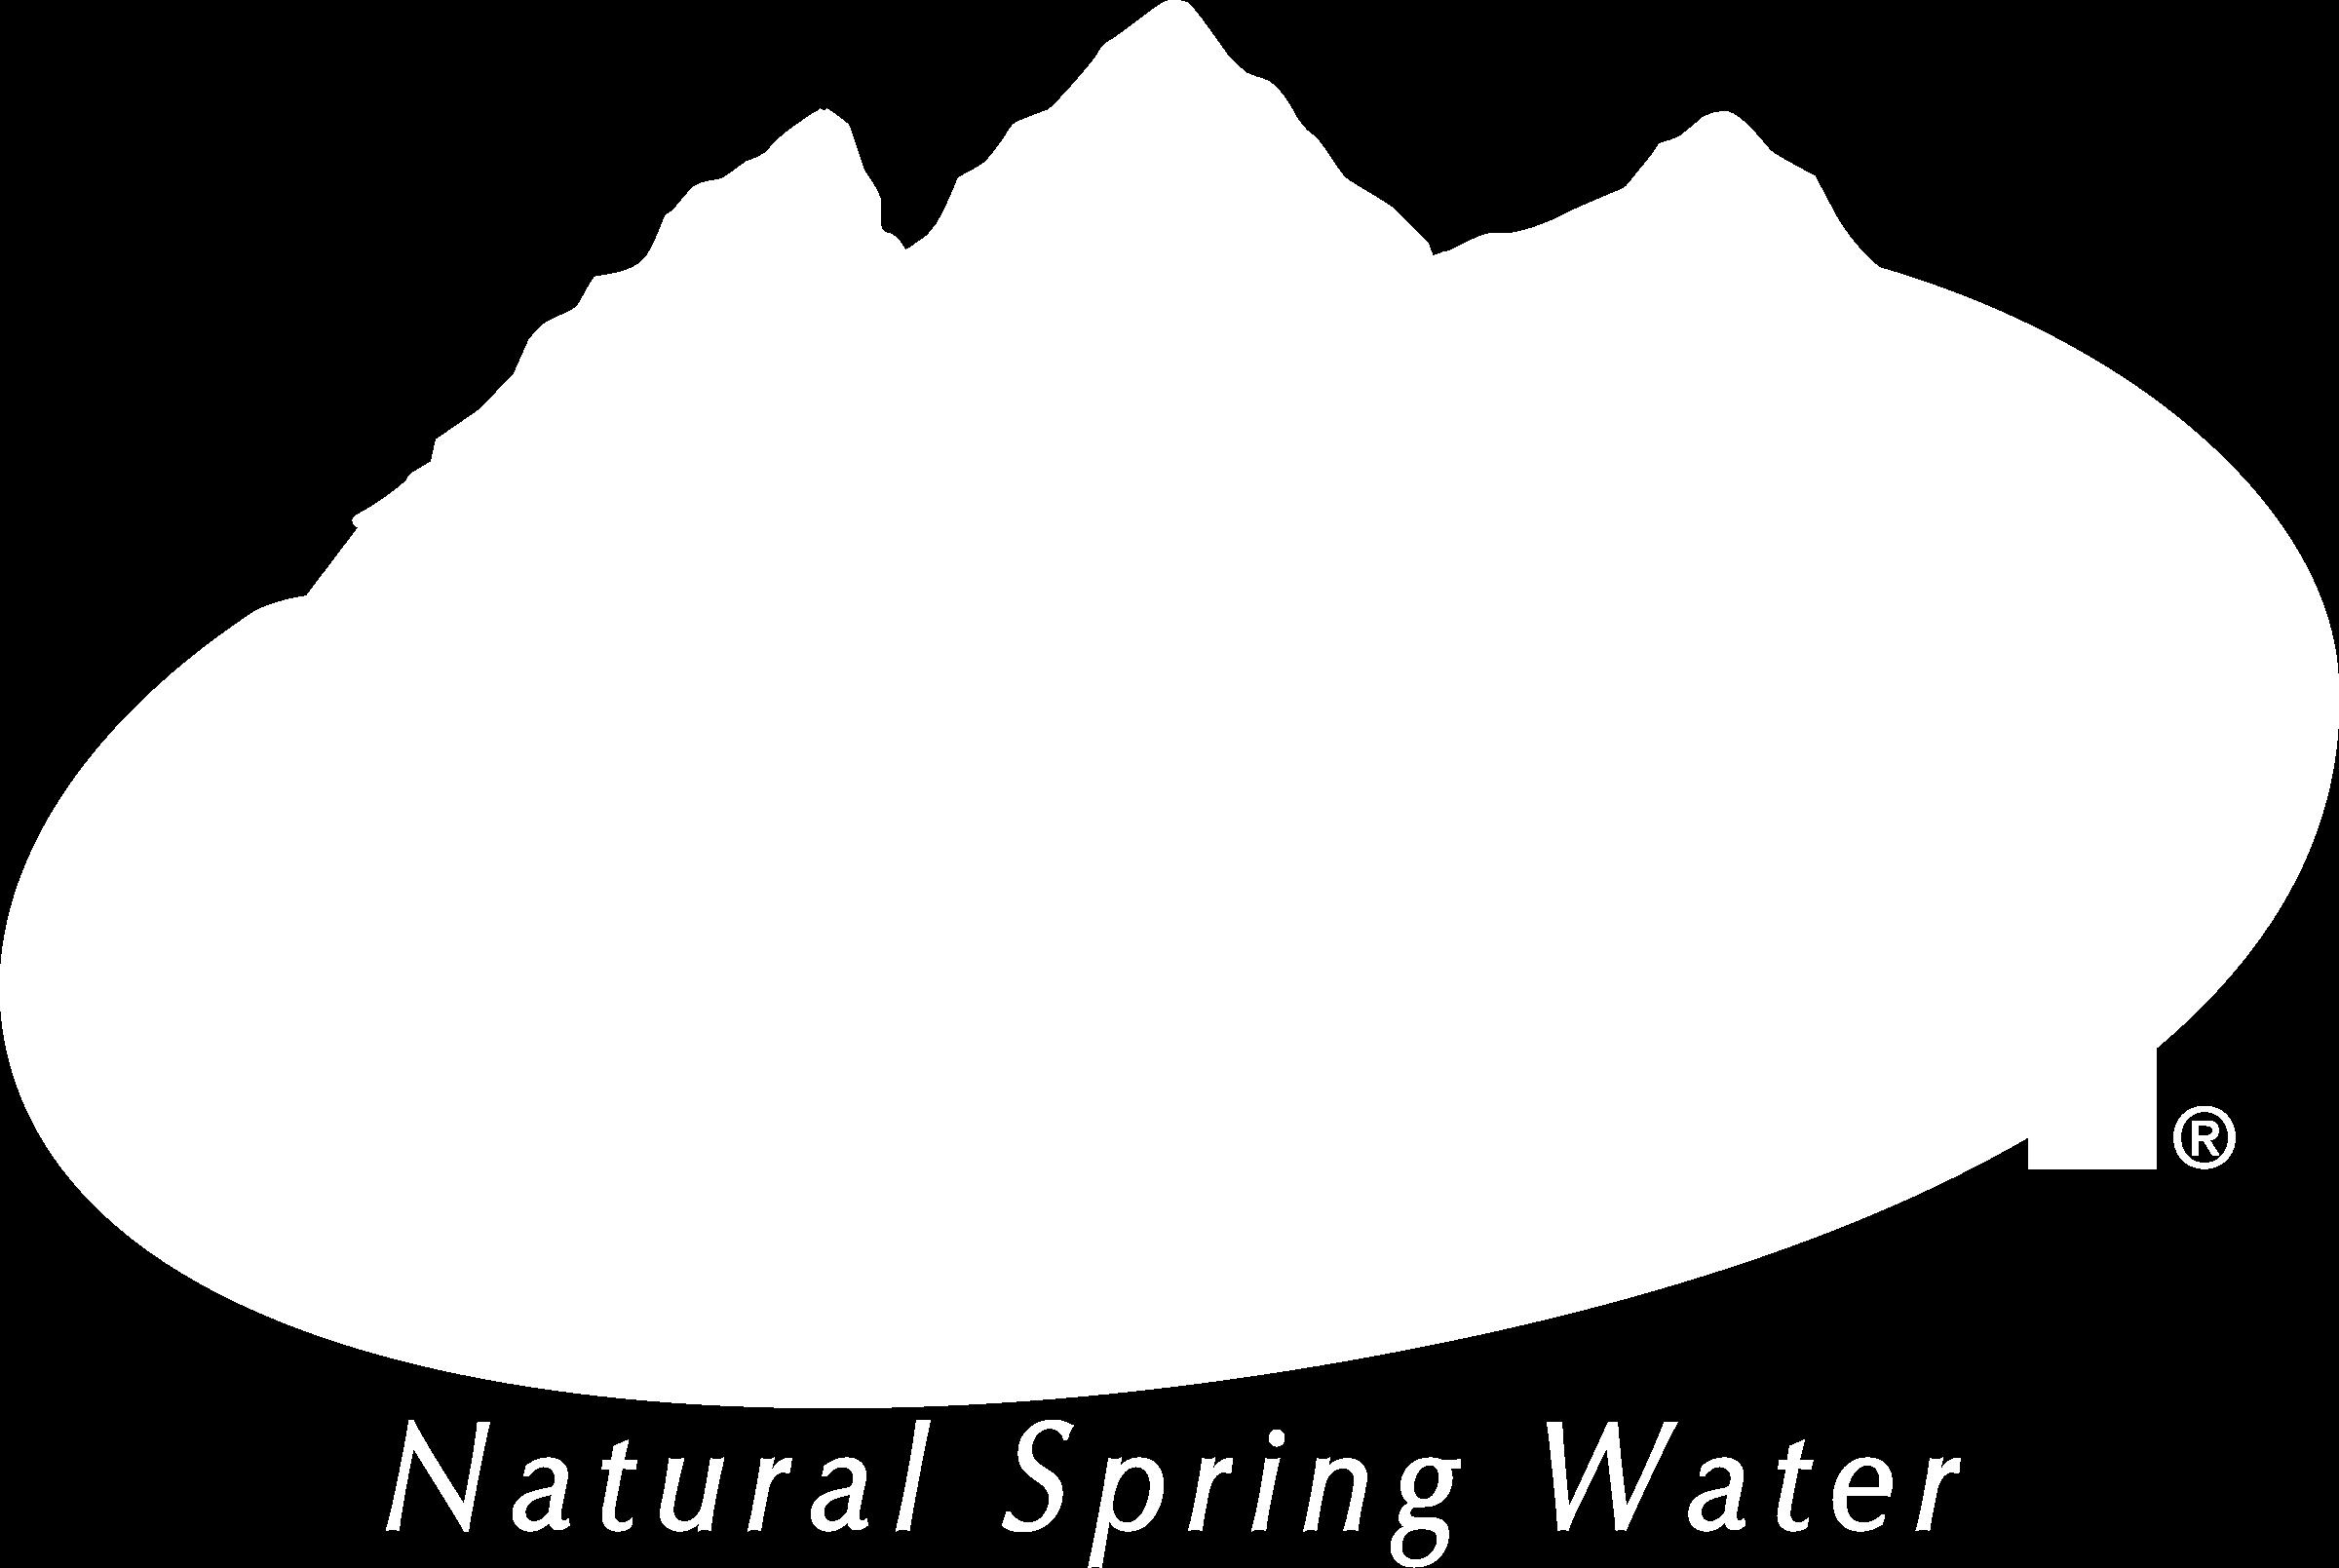 Evian Logo PNG Transparent & SVG Vector.